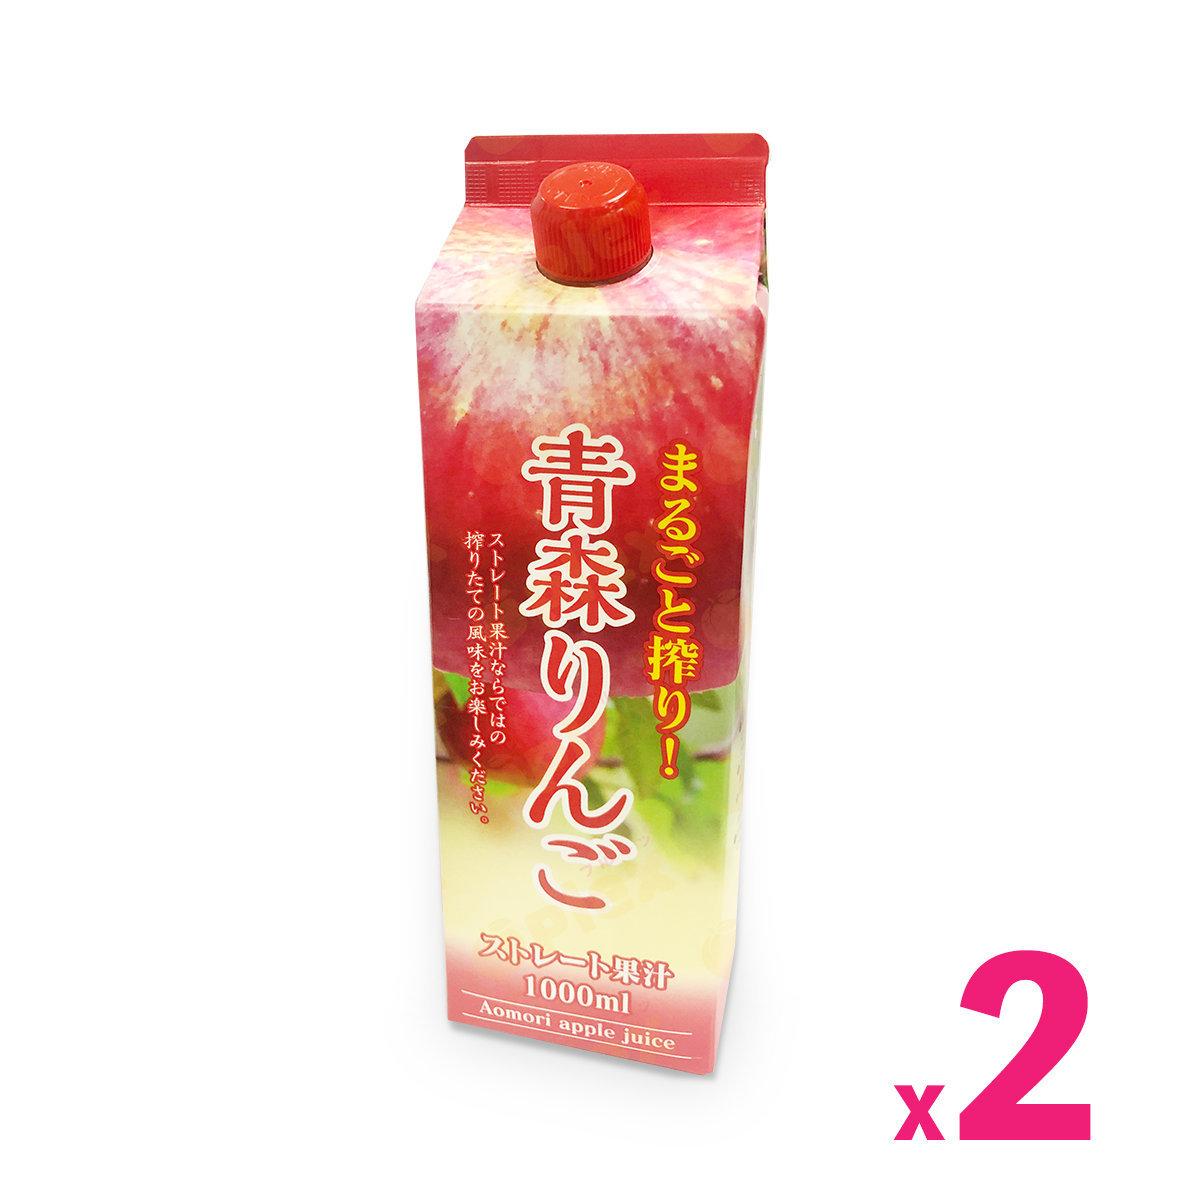 Aomori Apple Juice (1000ml)x 2packs